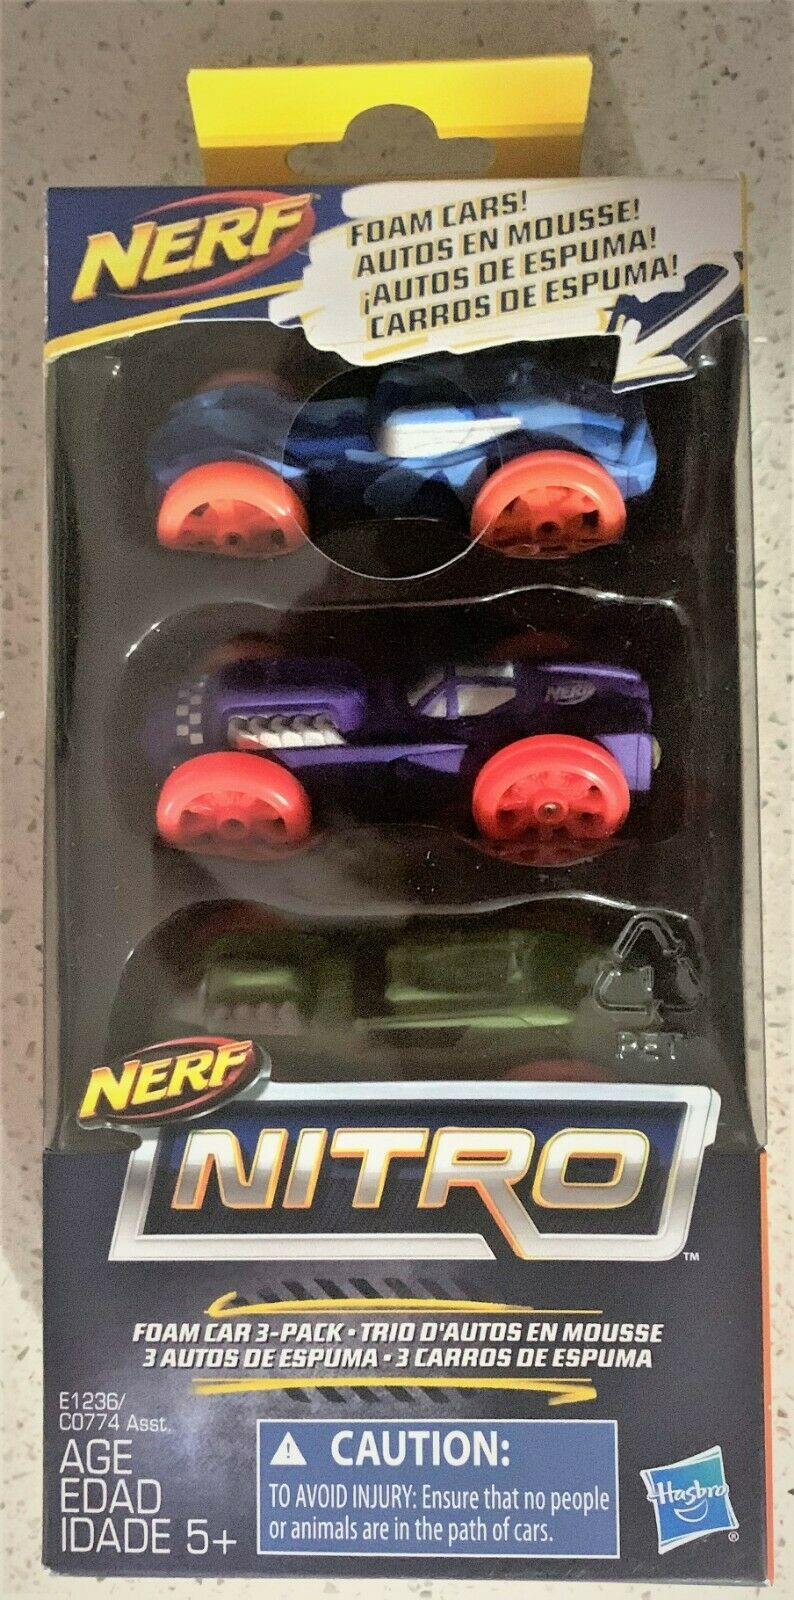 Nerf Nitro Foam Car 3-Pack Version 7 Hasbro E1235